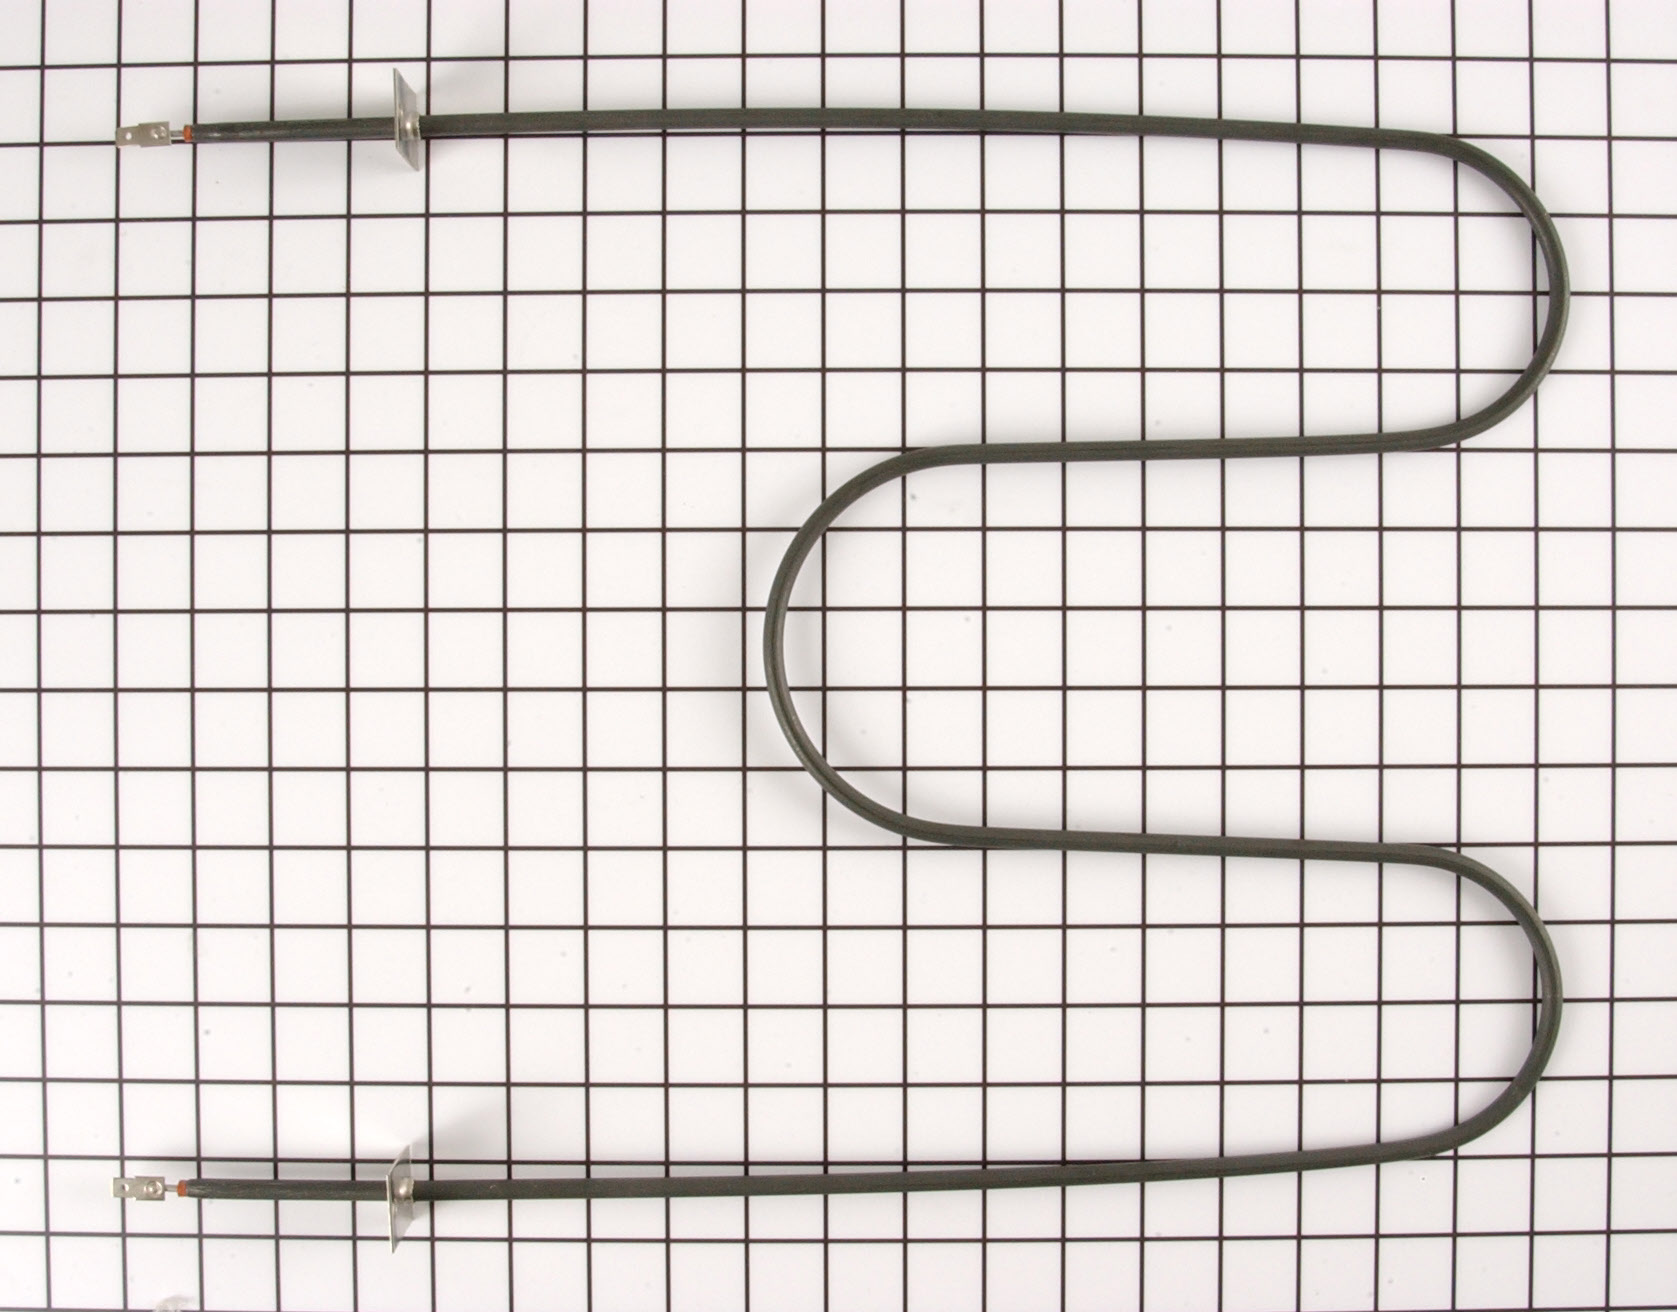 Jenn Air Range/Stove/Oven Part # W10201551 - Broil Element